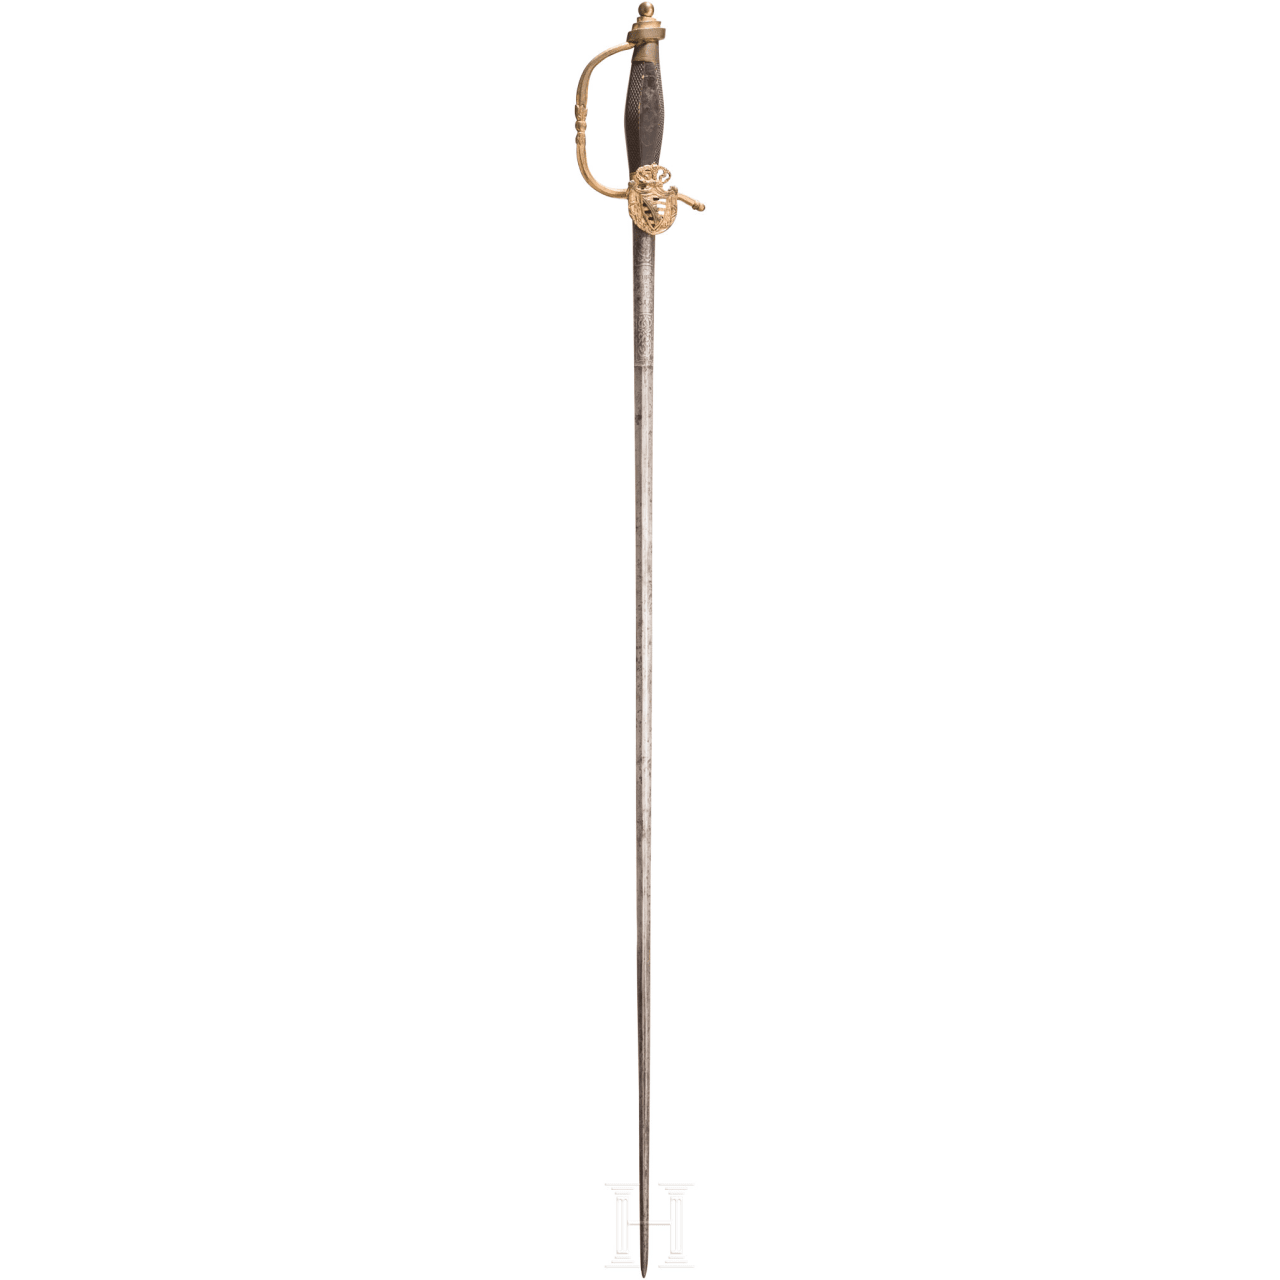 Gala sword, 18th century